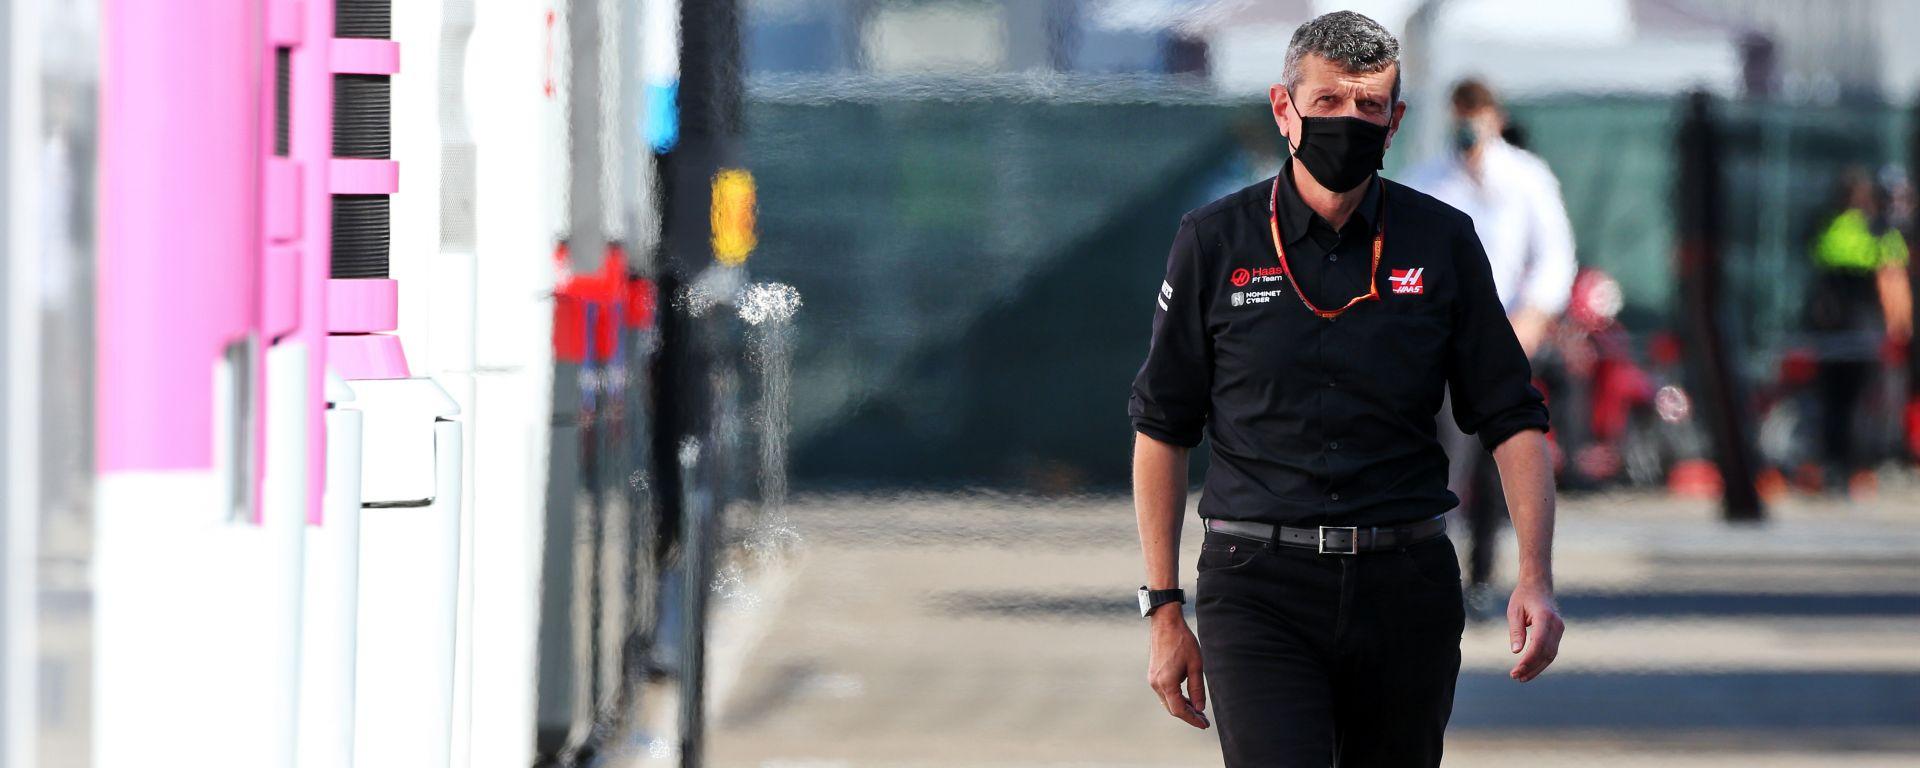 F1 GP Toscana Ferrari 1000, Mugello: Gunther Steiner (Haas)